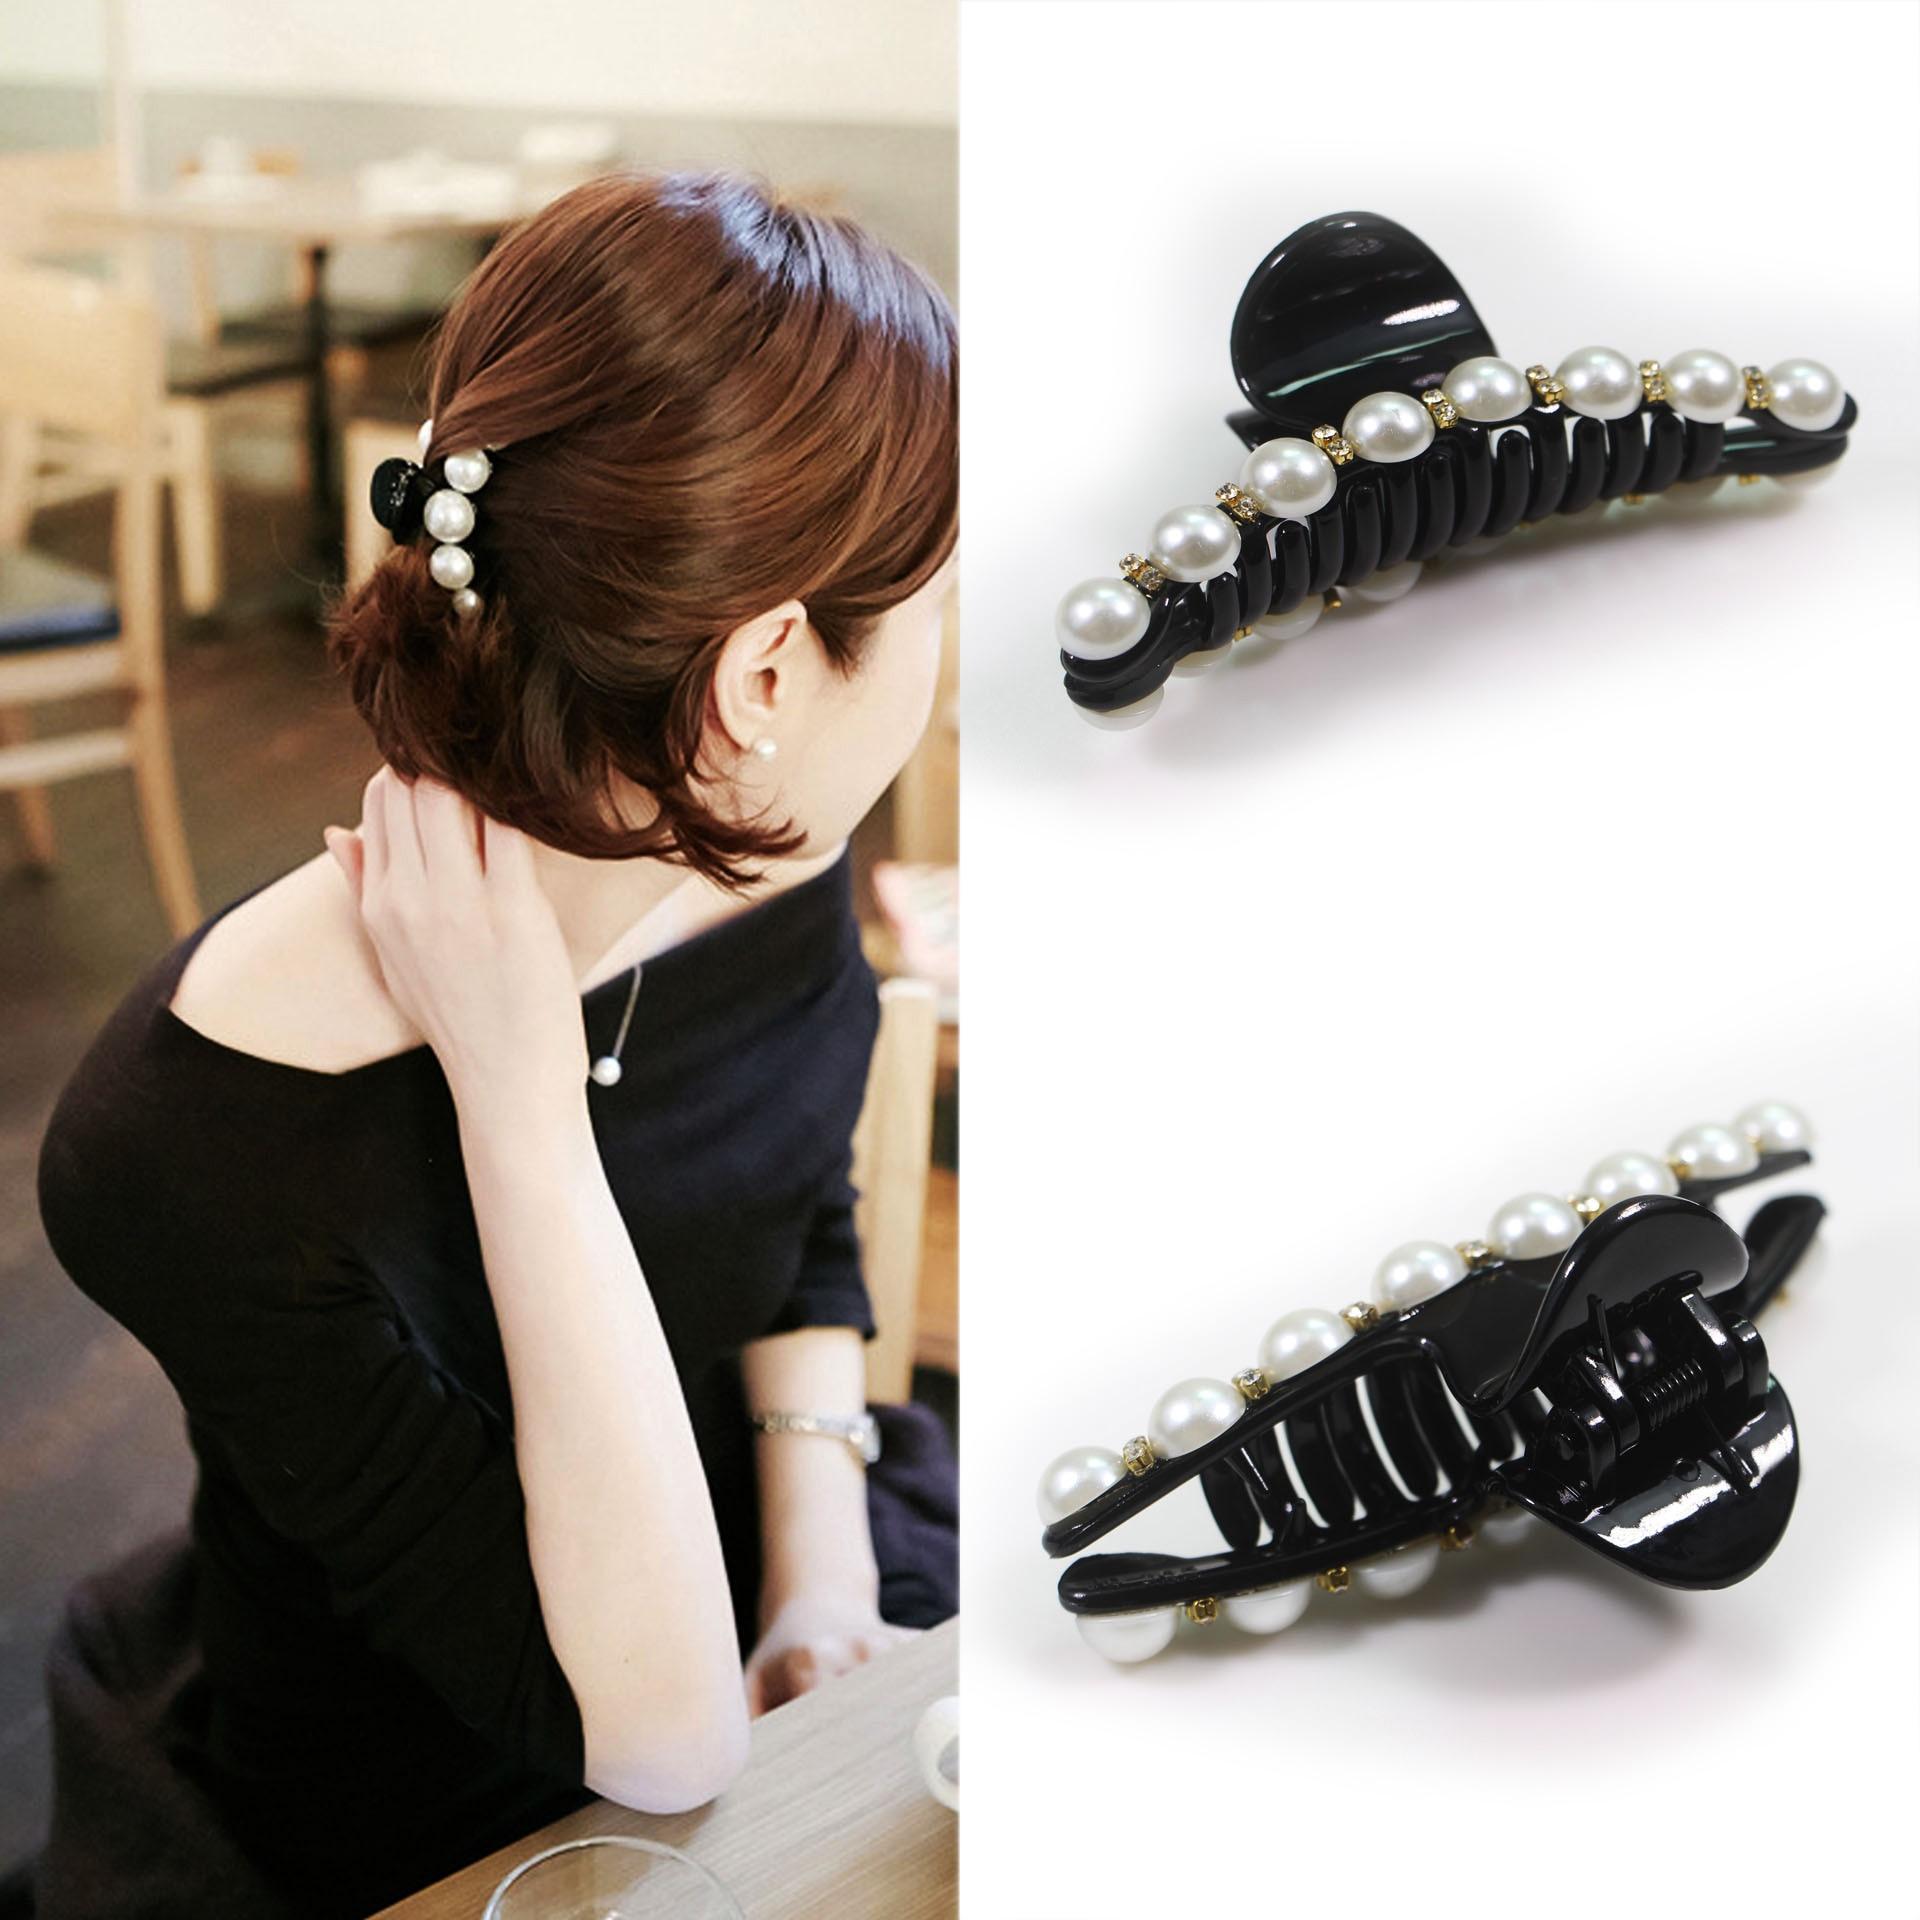 Luxury Pearls Hairpins Black Crystal Hair Banana Clips Small Grasp Clip Hairpin Accessories Headwear